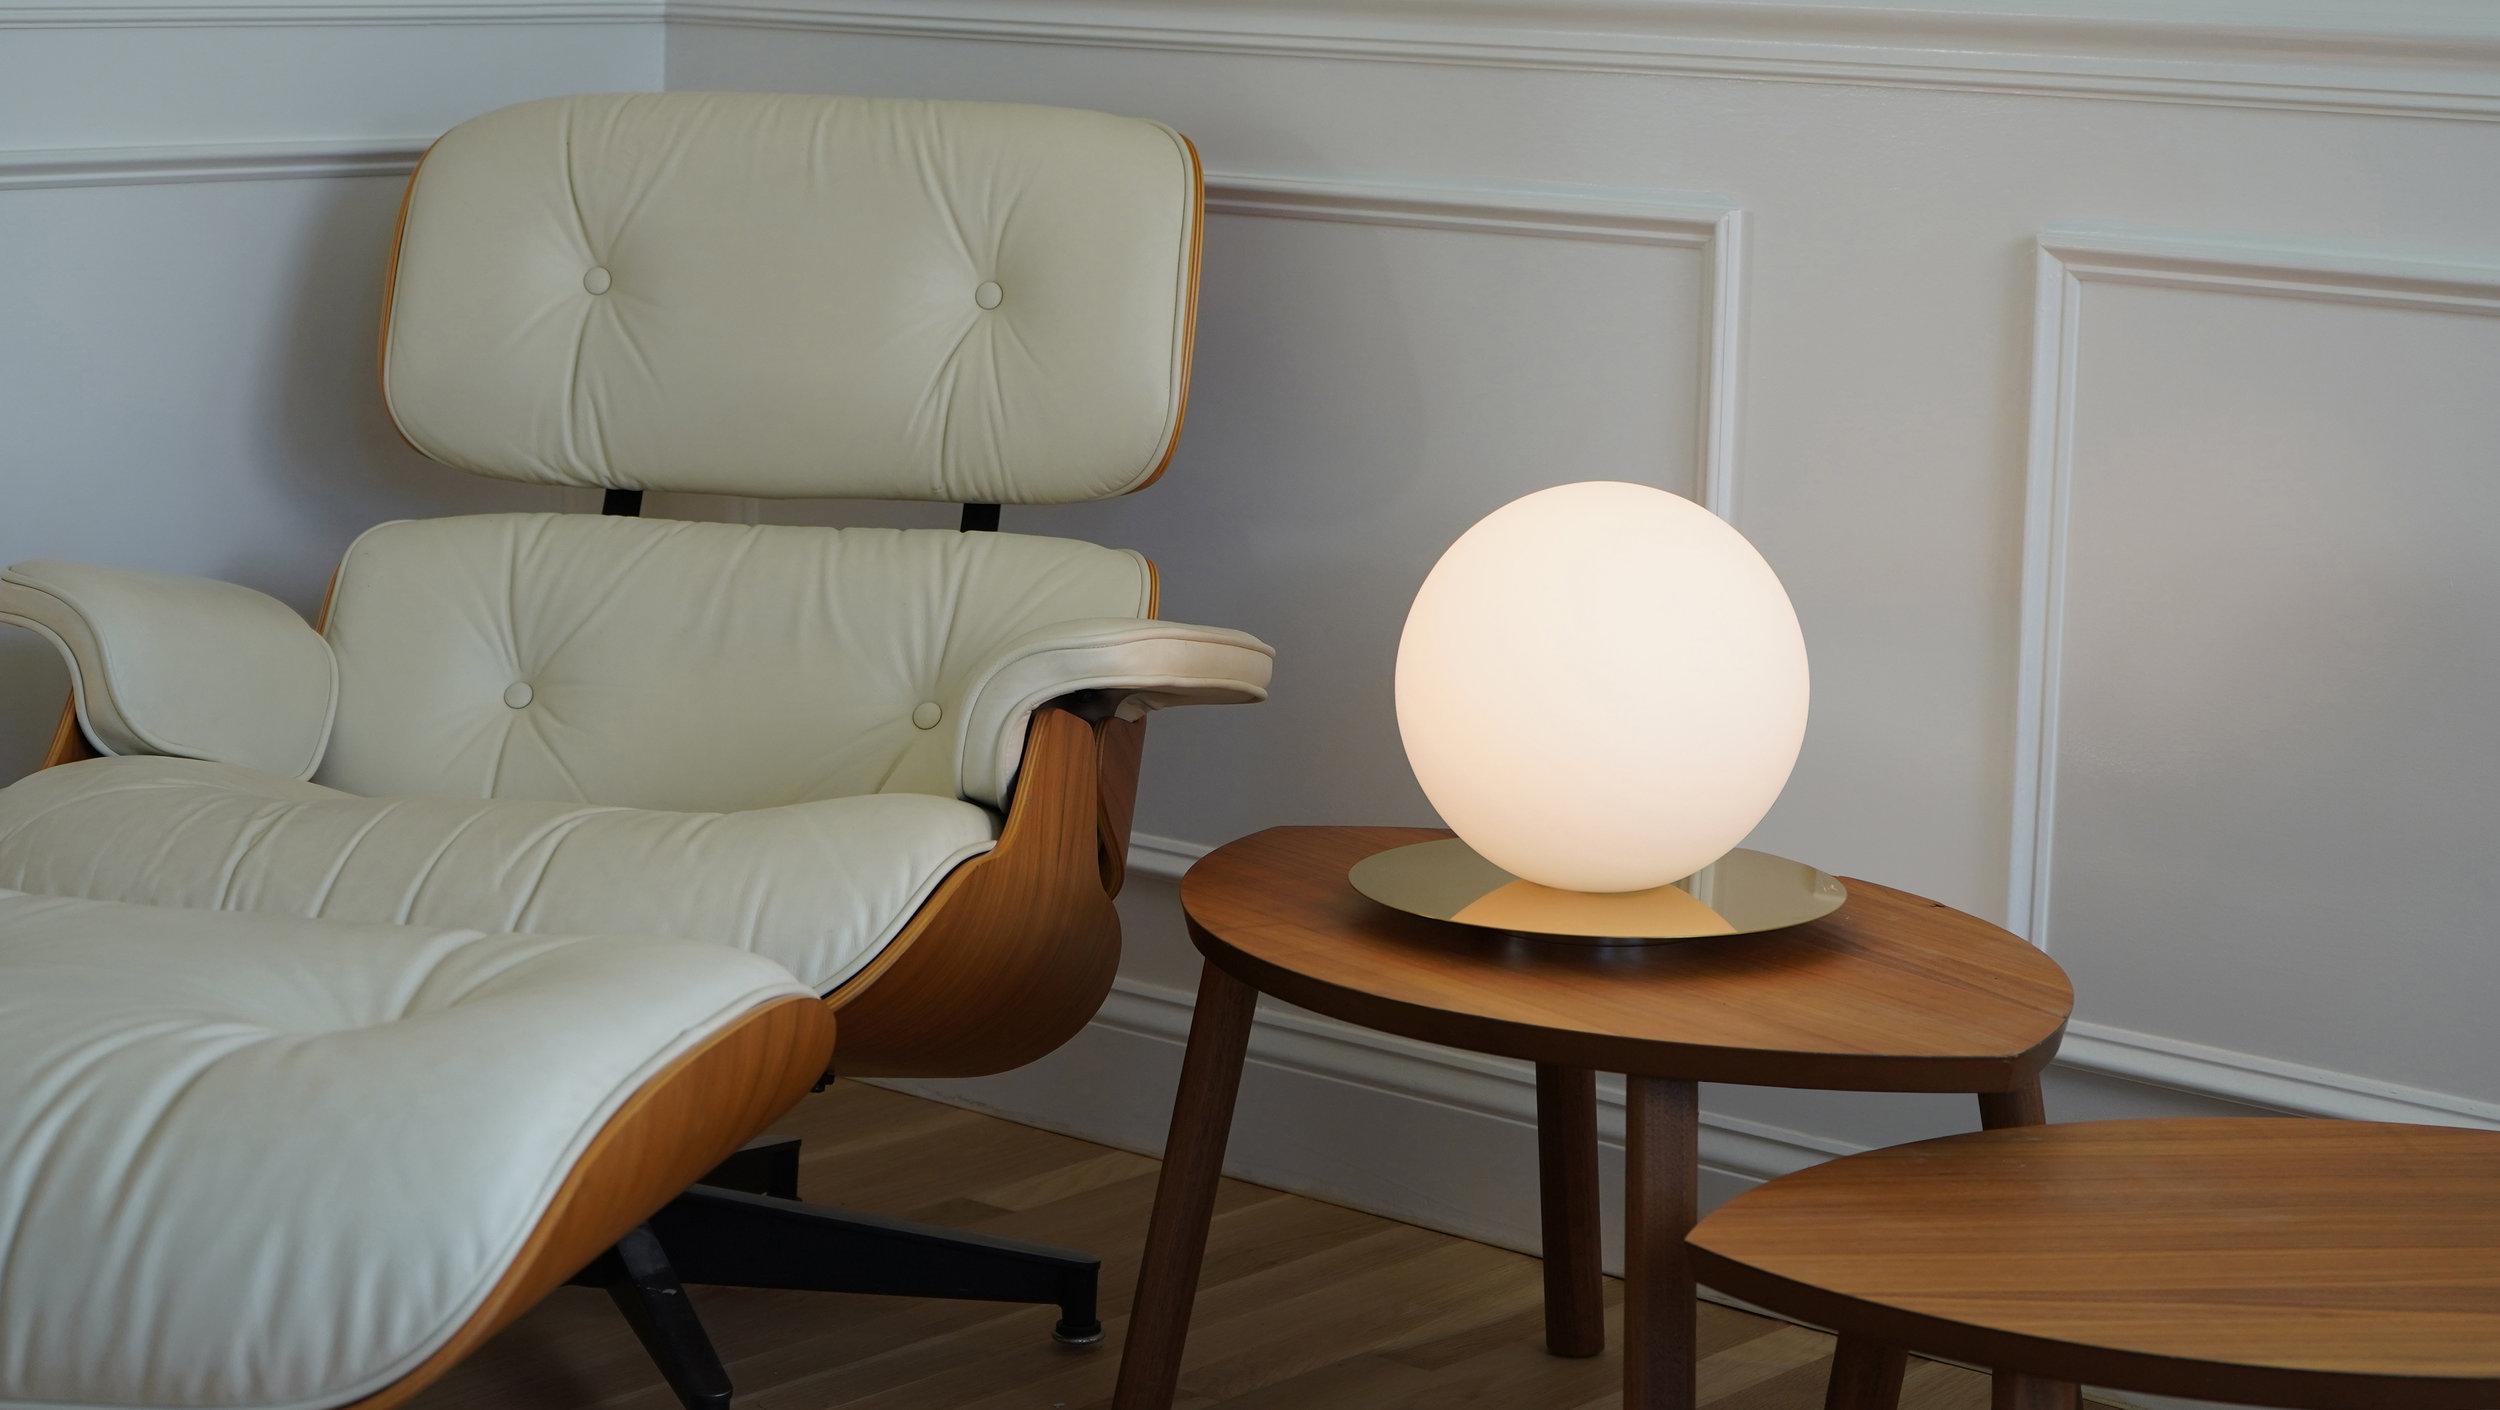 Bola Sphere Table, Evironmental, Chaise Lounge_300.jpg